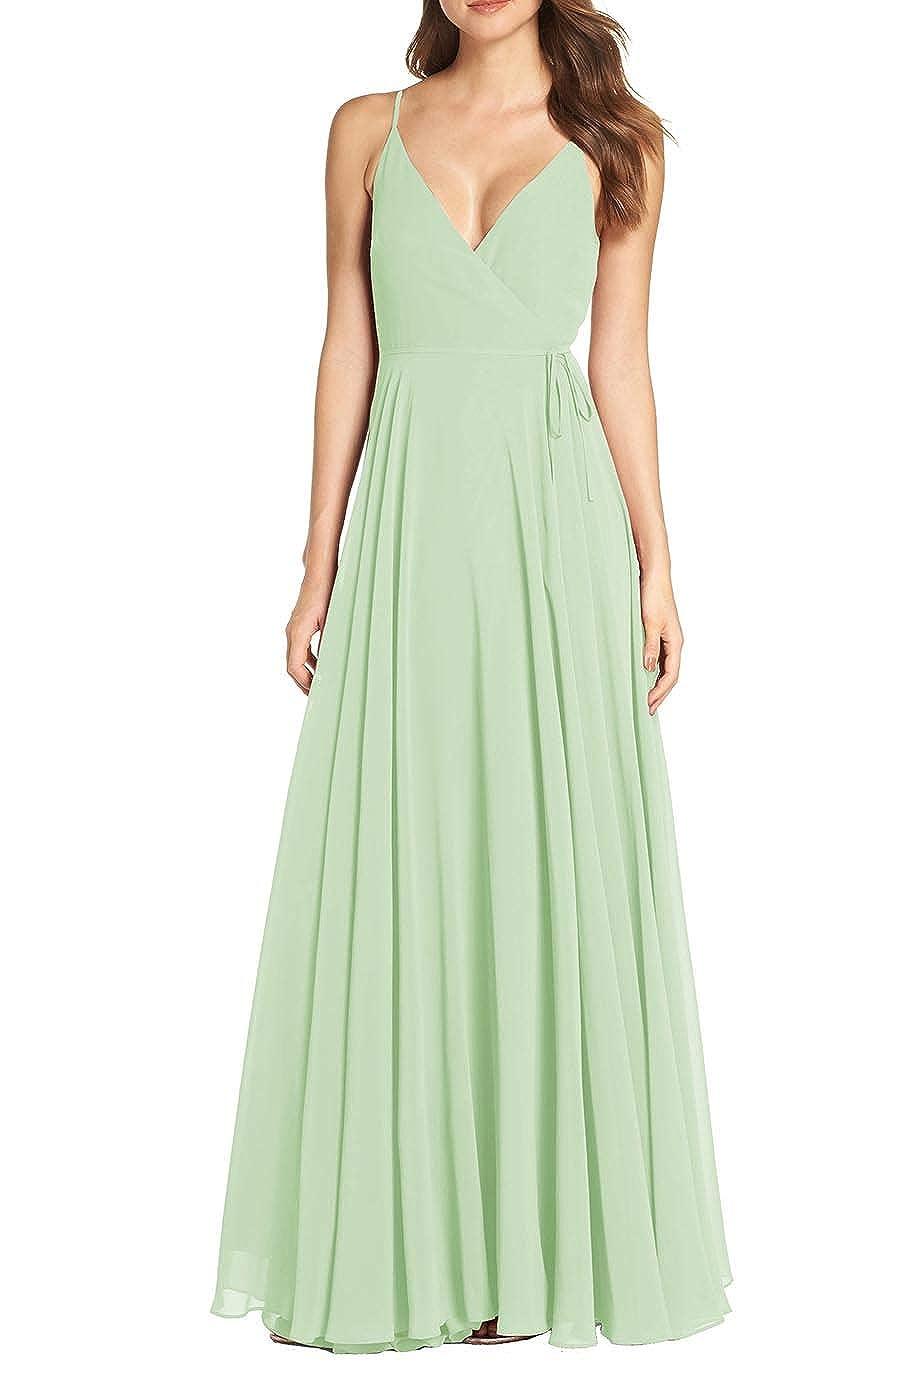 Pale Green RTTUTED Women's V Neck Sleeveless Evening Dresses Long Prom Gown Bridesmaid Maxi Skirt